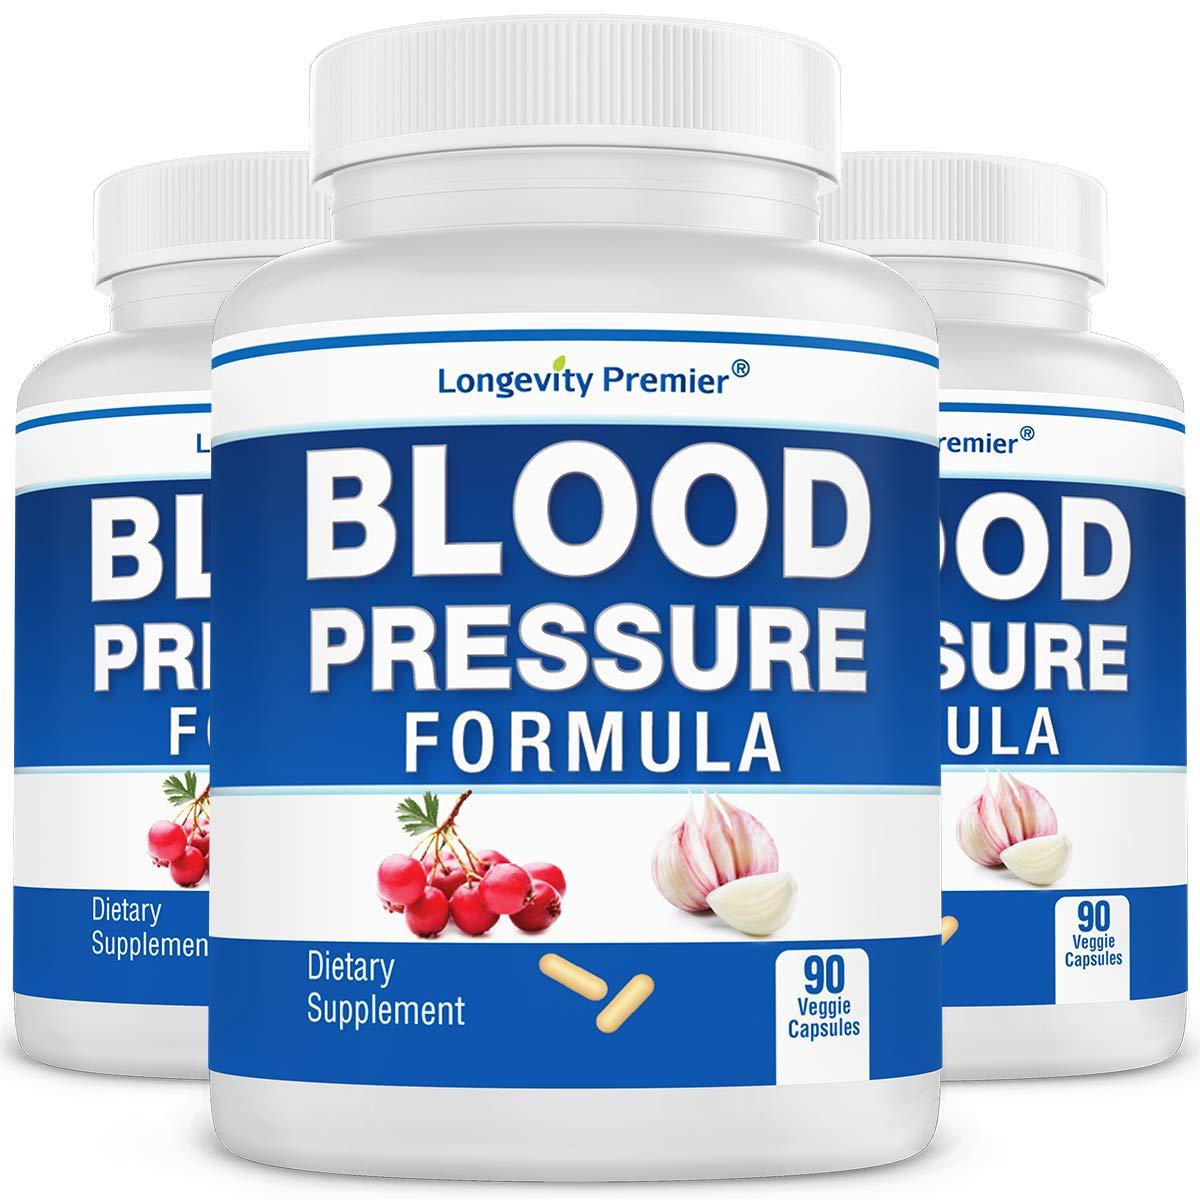 3 Bottle Value Longevity Pressure Formula